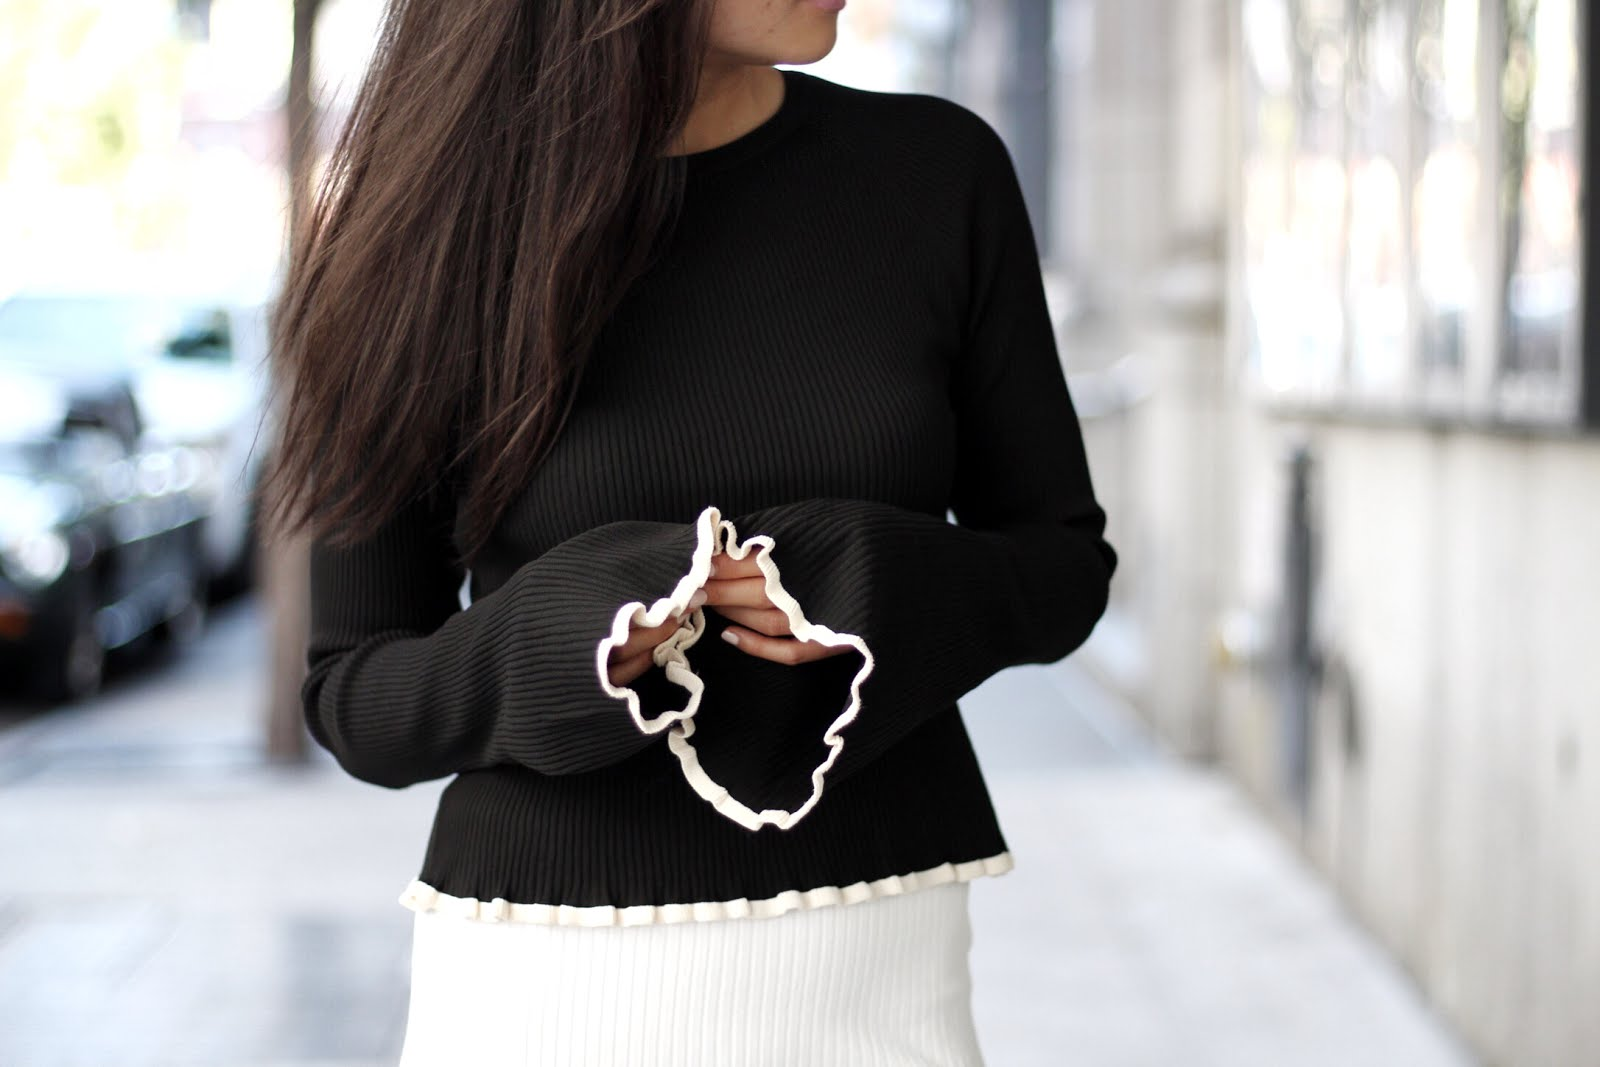 Zara bell sleeve sweater knit fall trends